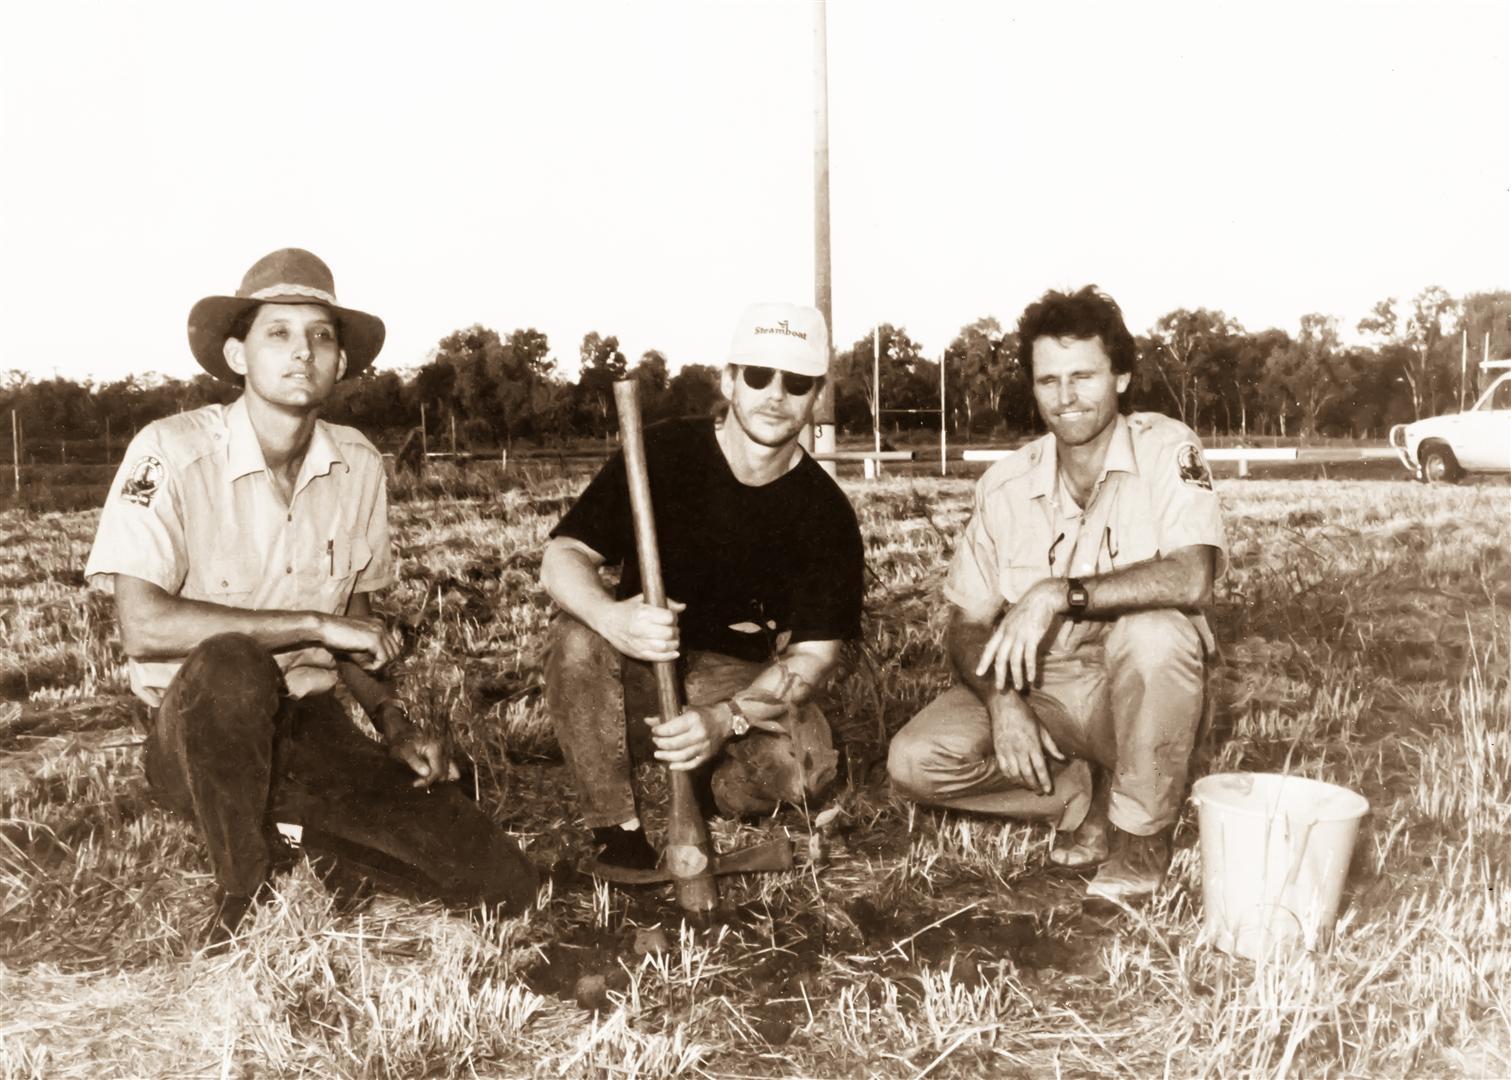 Warren Zevon with ranger Martin Ambrose (left) and (right).